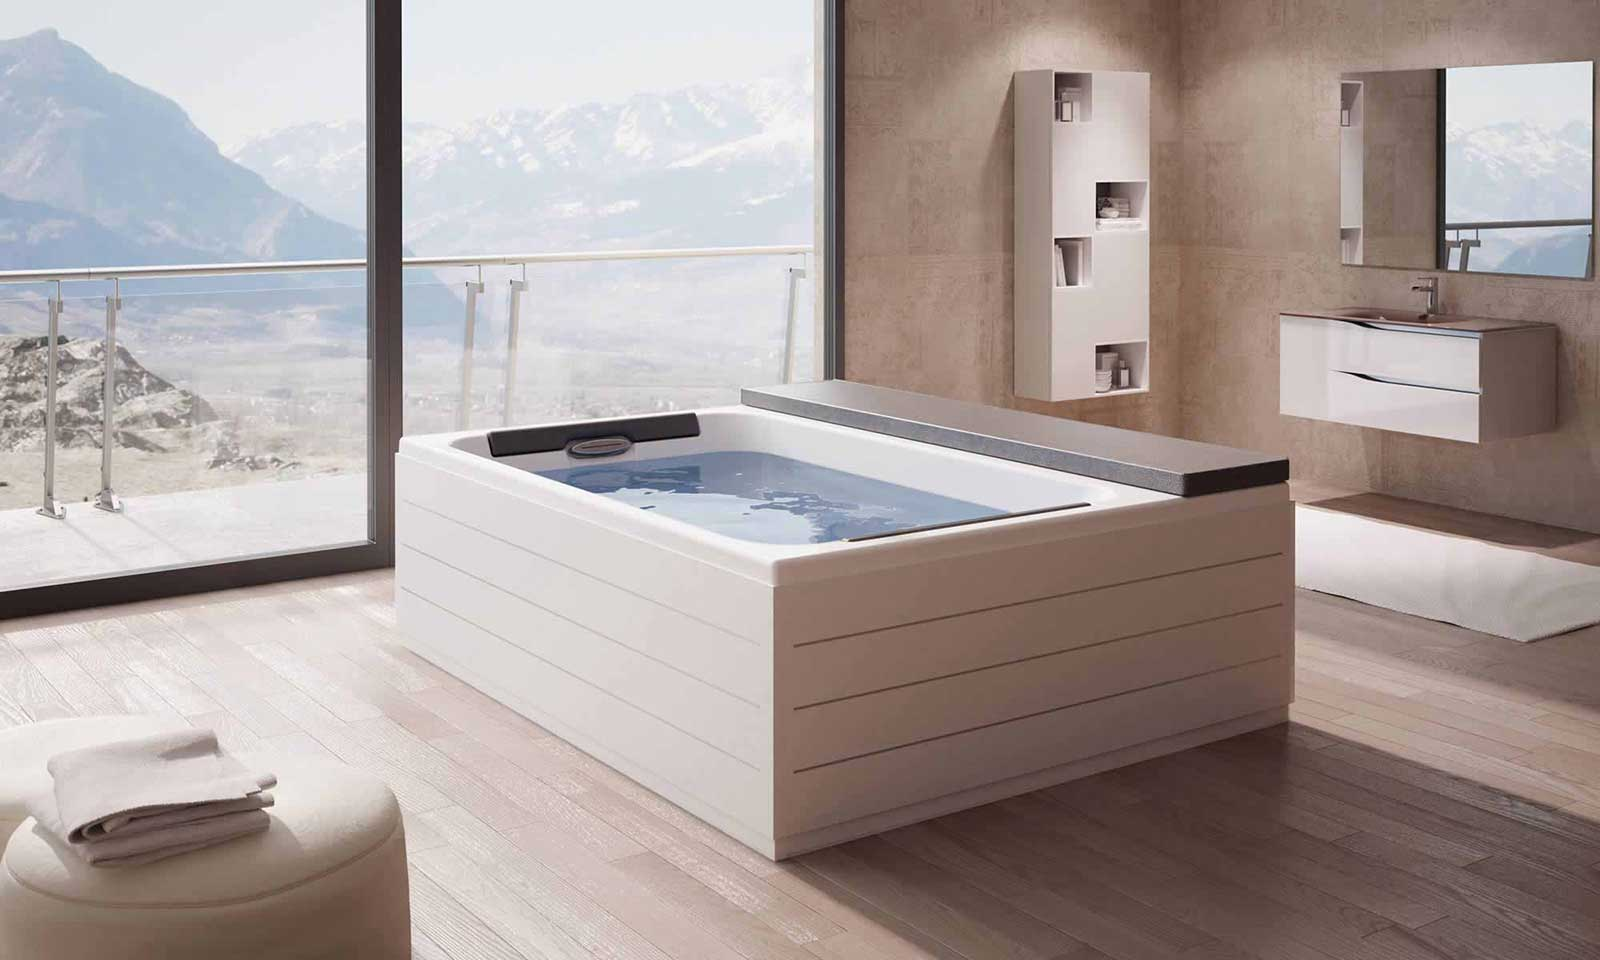 granform vasche idromassaggio arredo casa design 2018 bra cuneo torino termosanitaria bra bagno doccia vasca.jpg